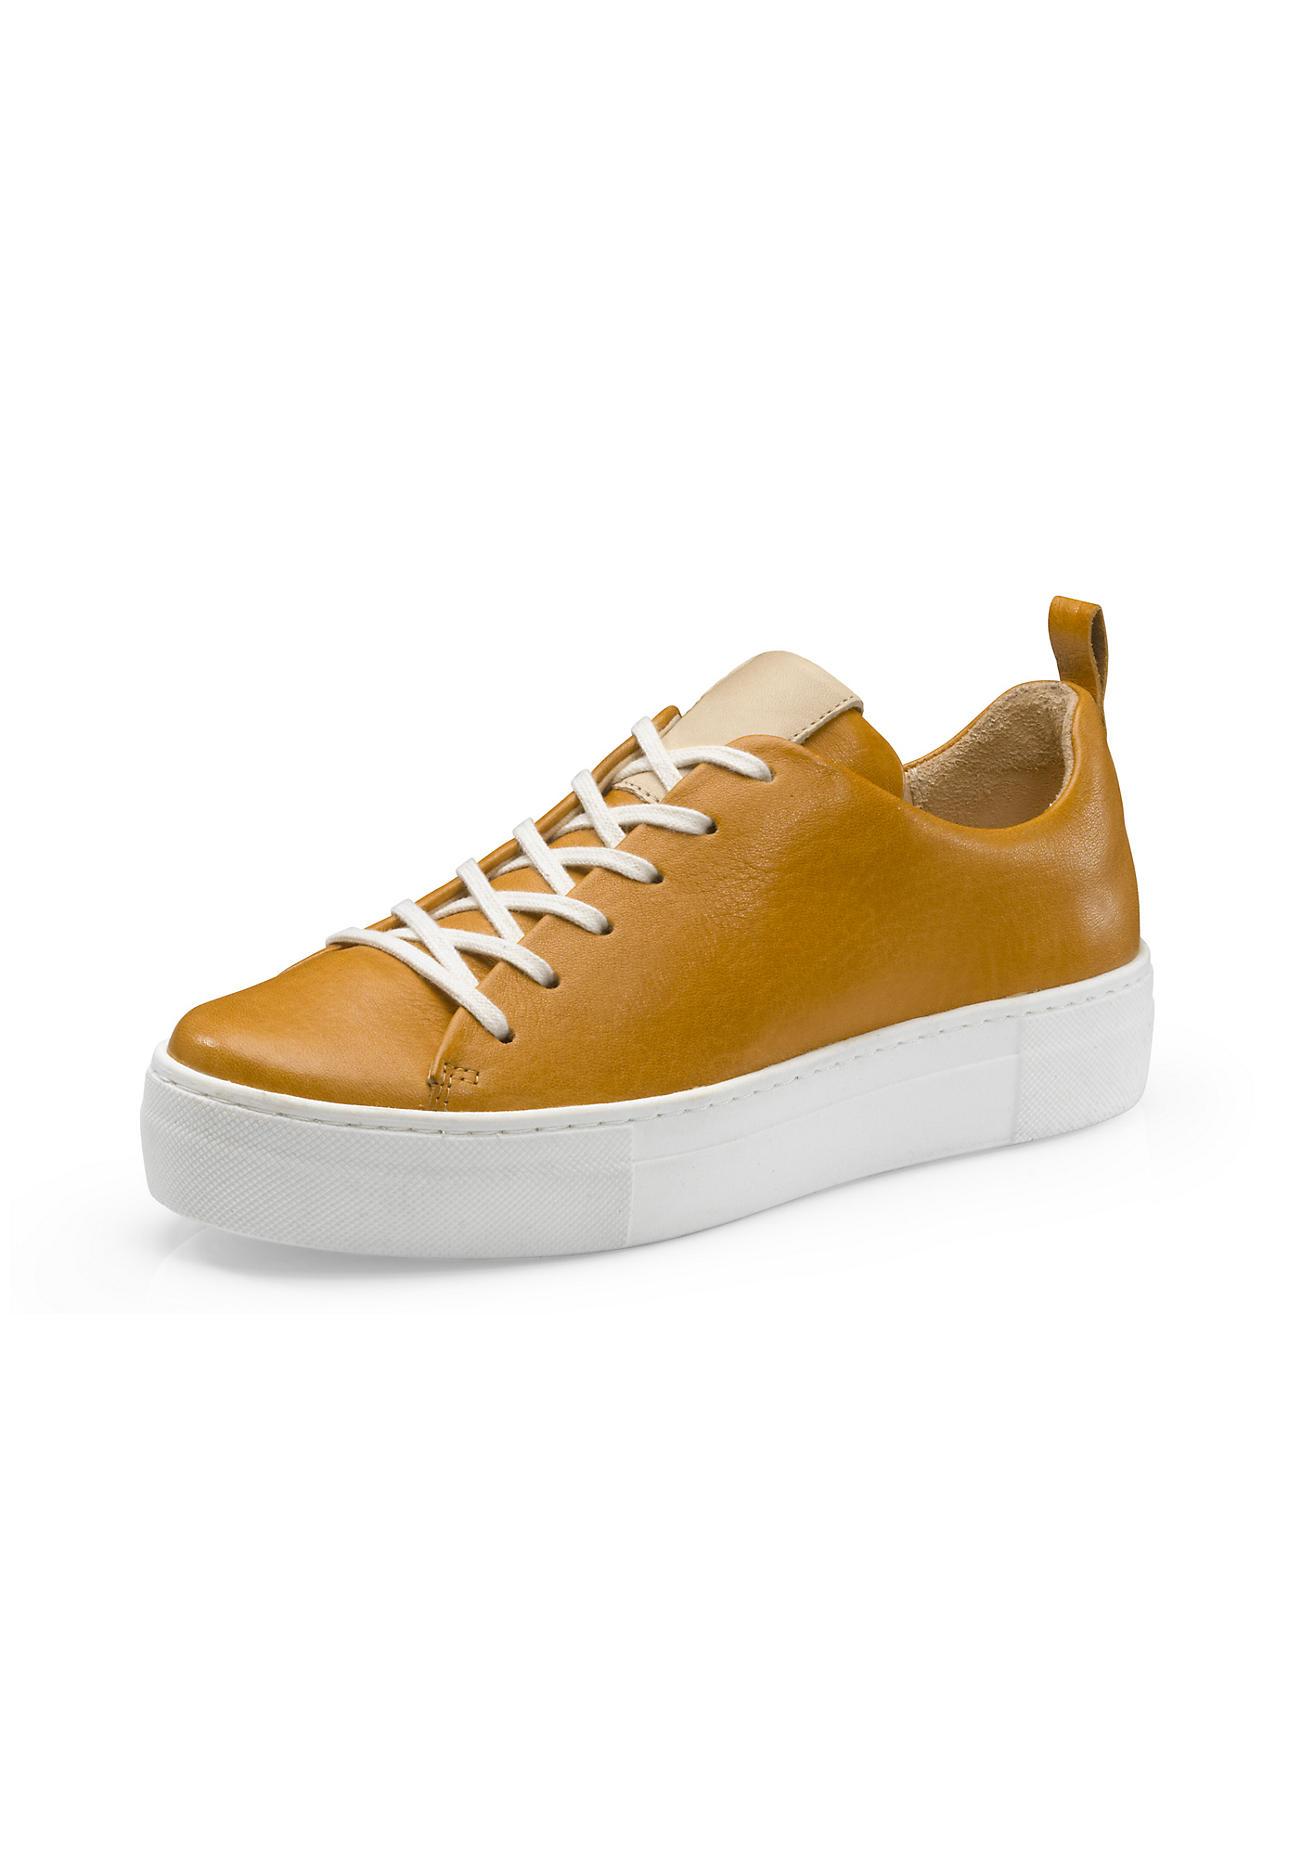 hessnatur Damen Damen Sneaker aus Leder – gelb – Größe 36